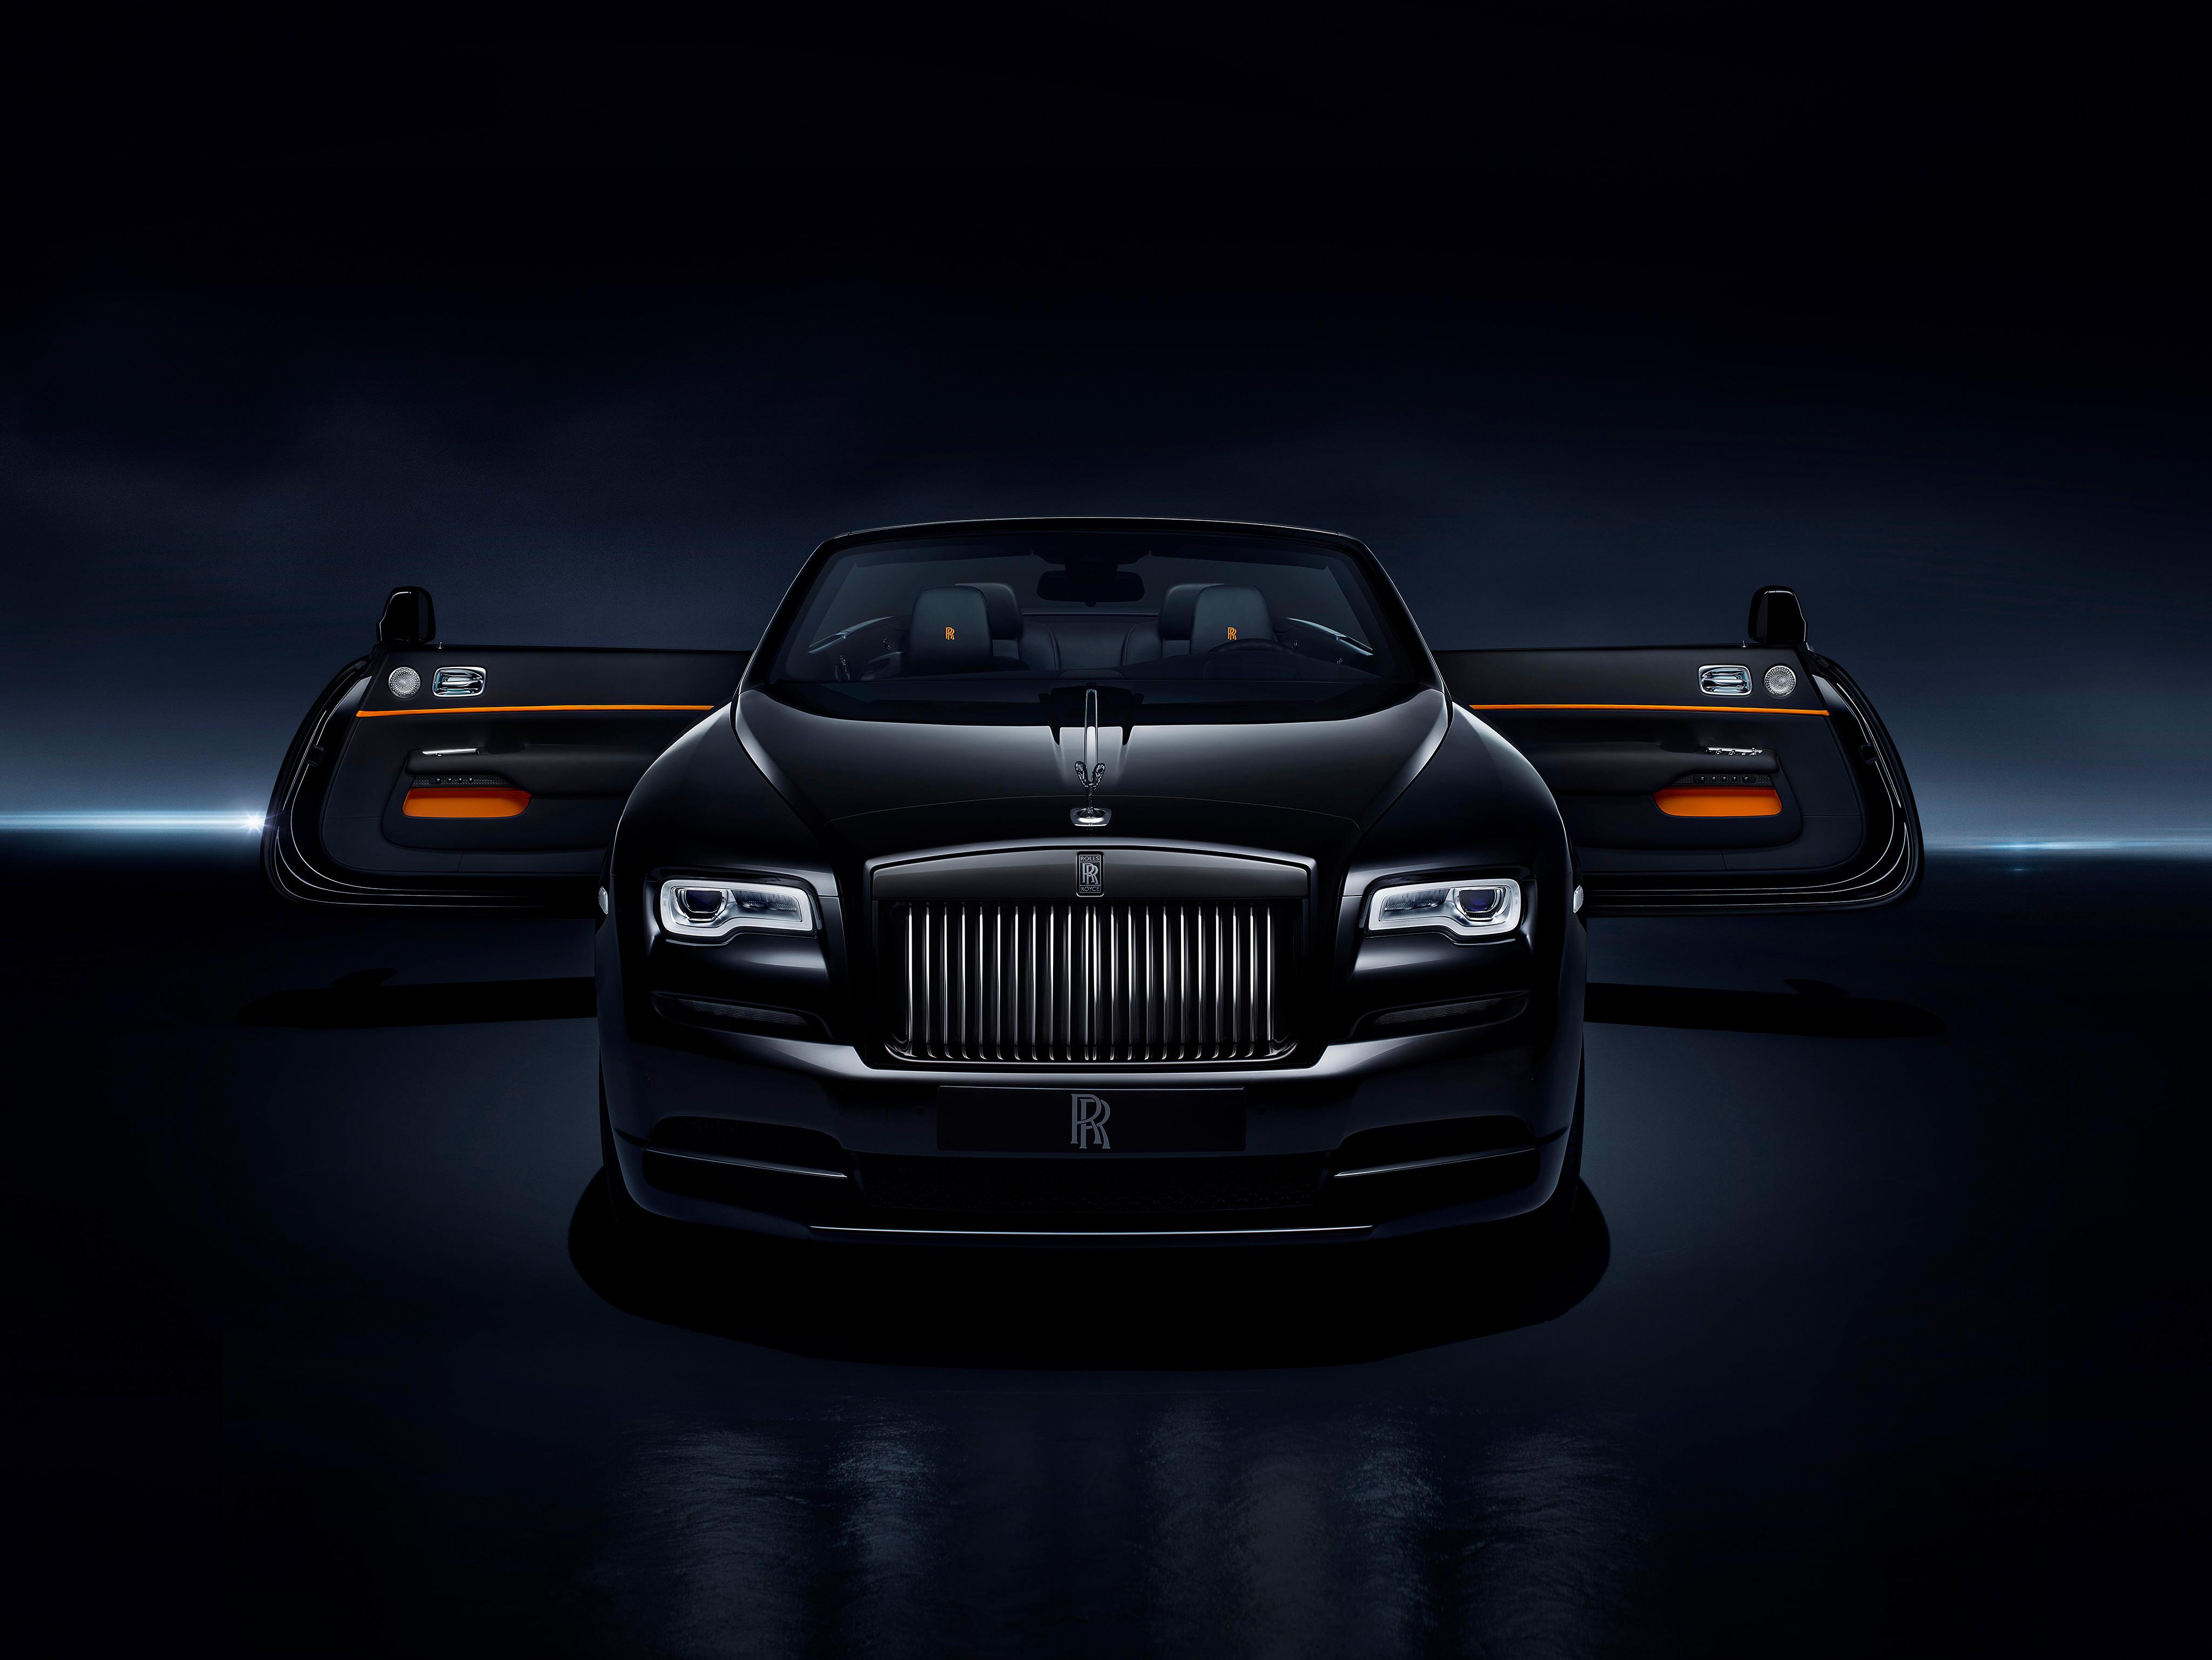 Rolls Royce Dawn Black Badge Interior 4k Hd Cars 4k Wallpapers